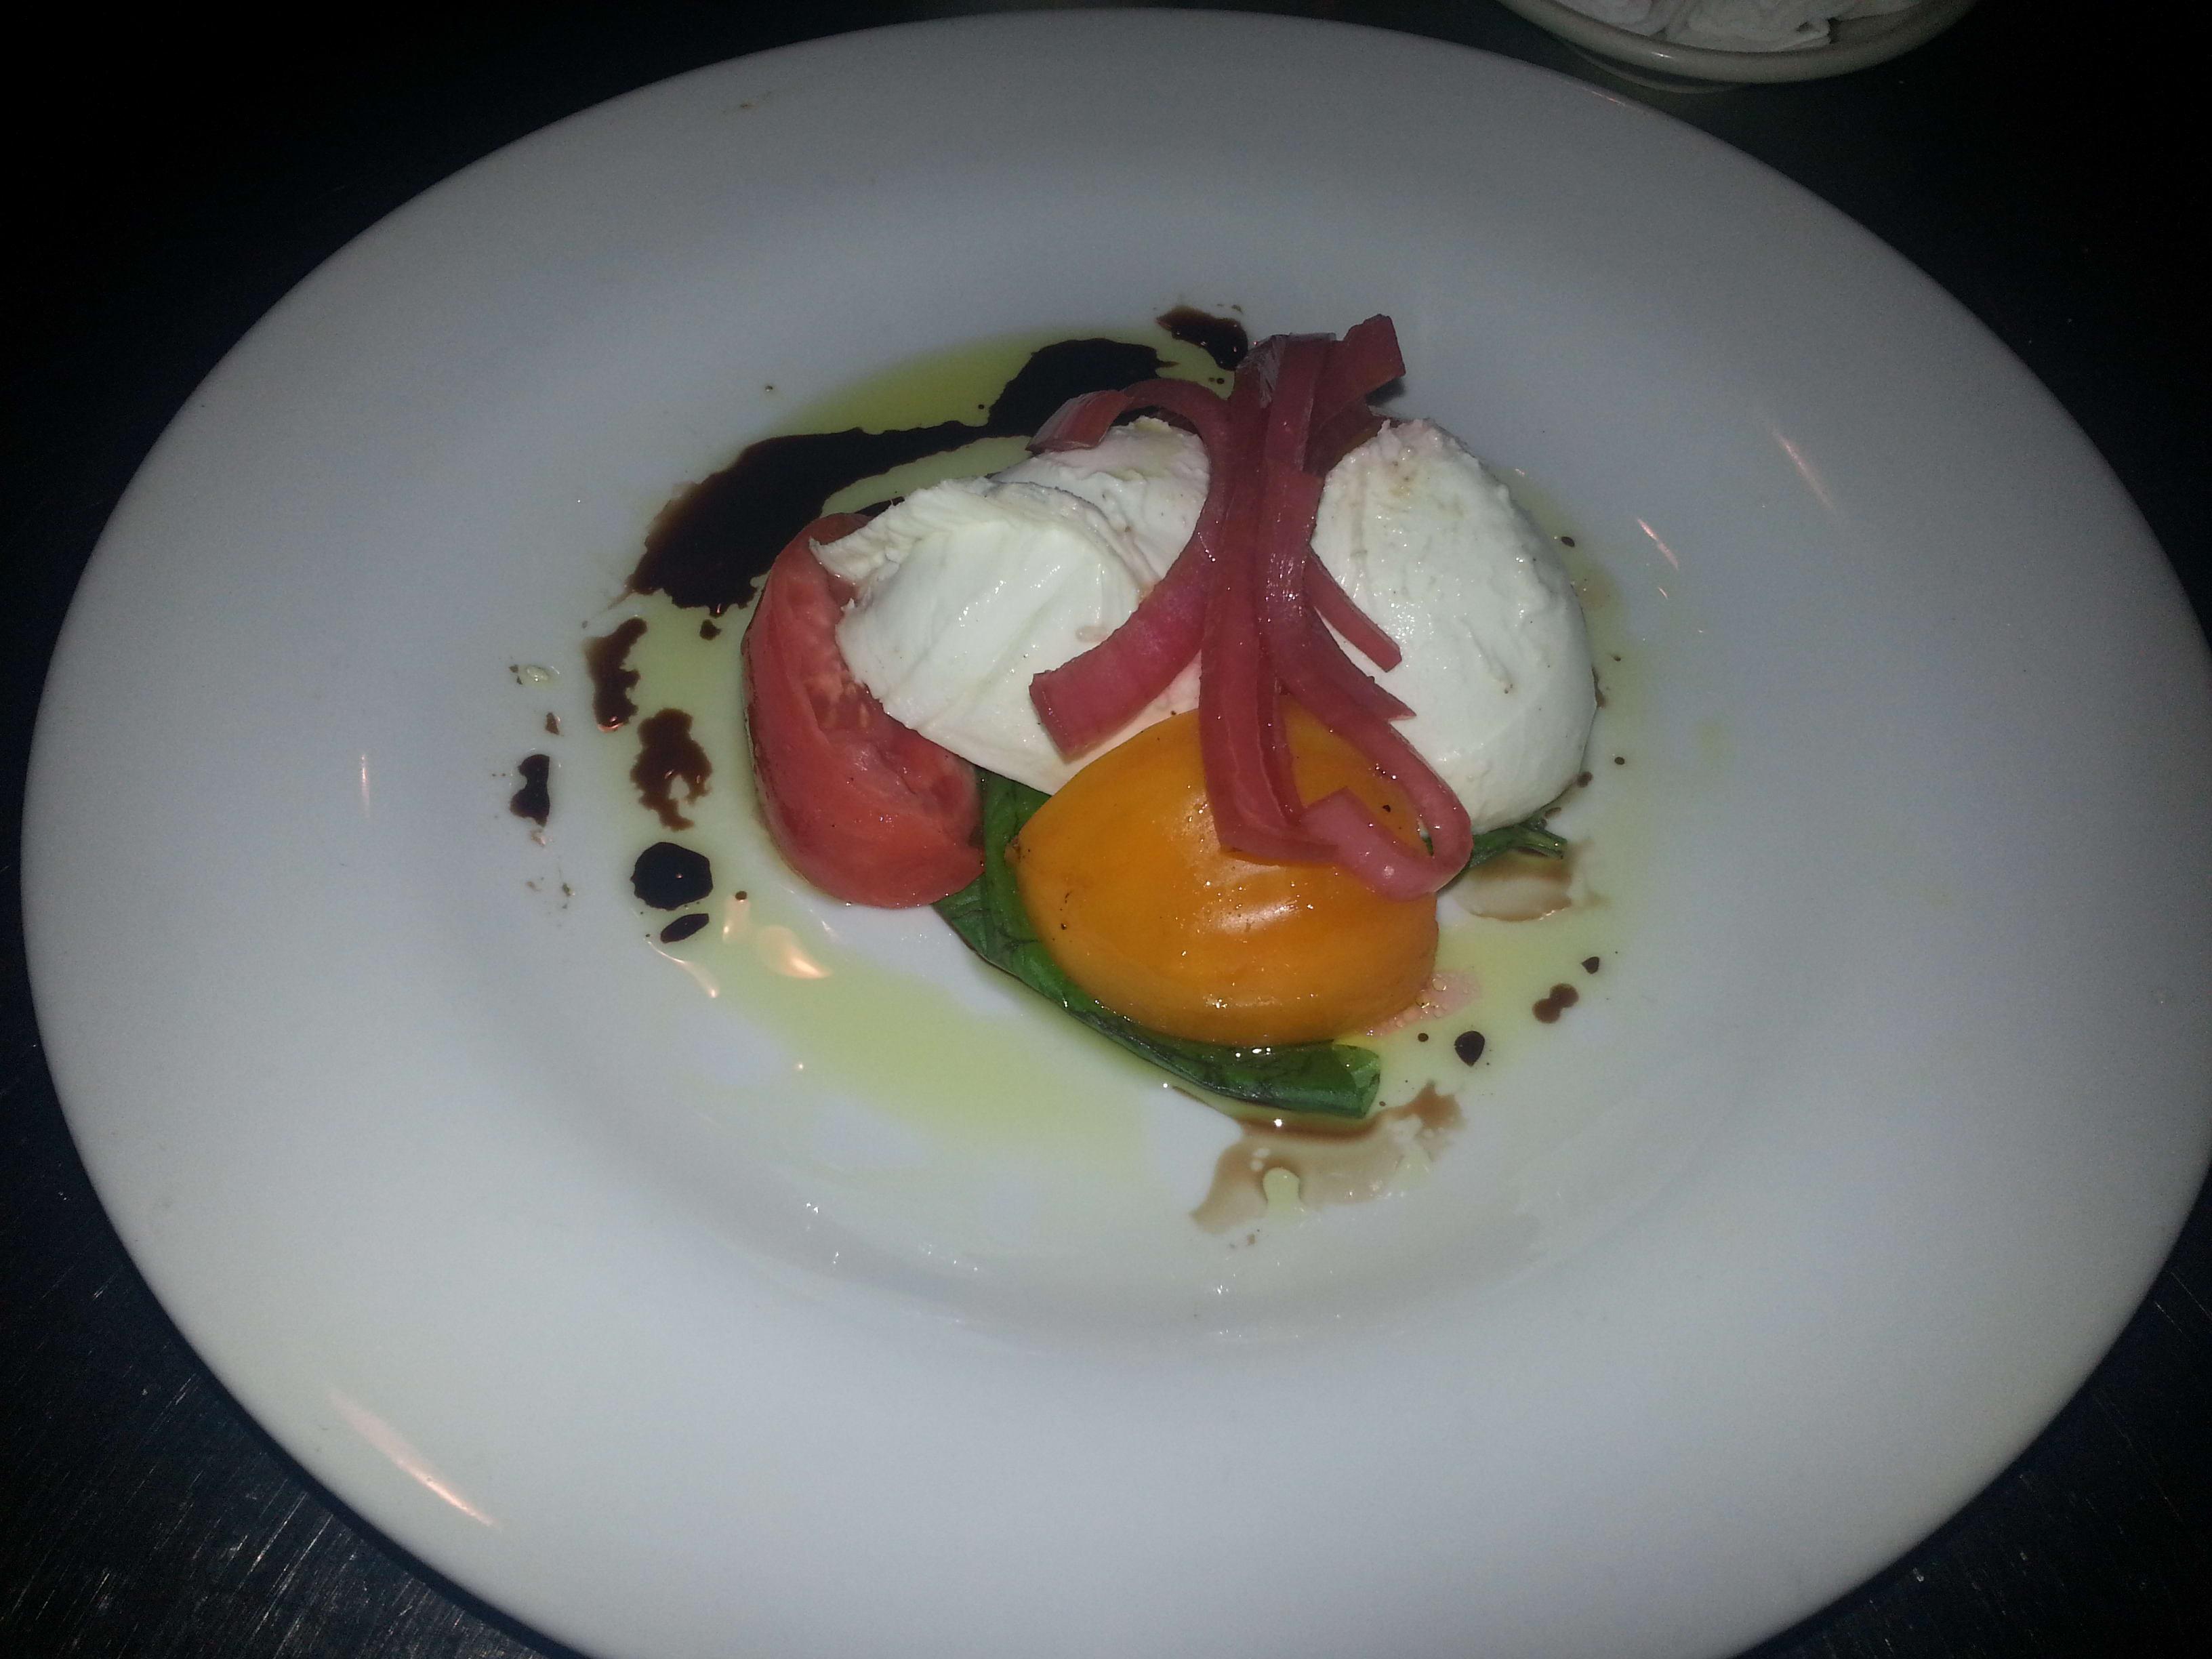 Mozzarella di Bufala at 32 East